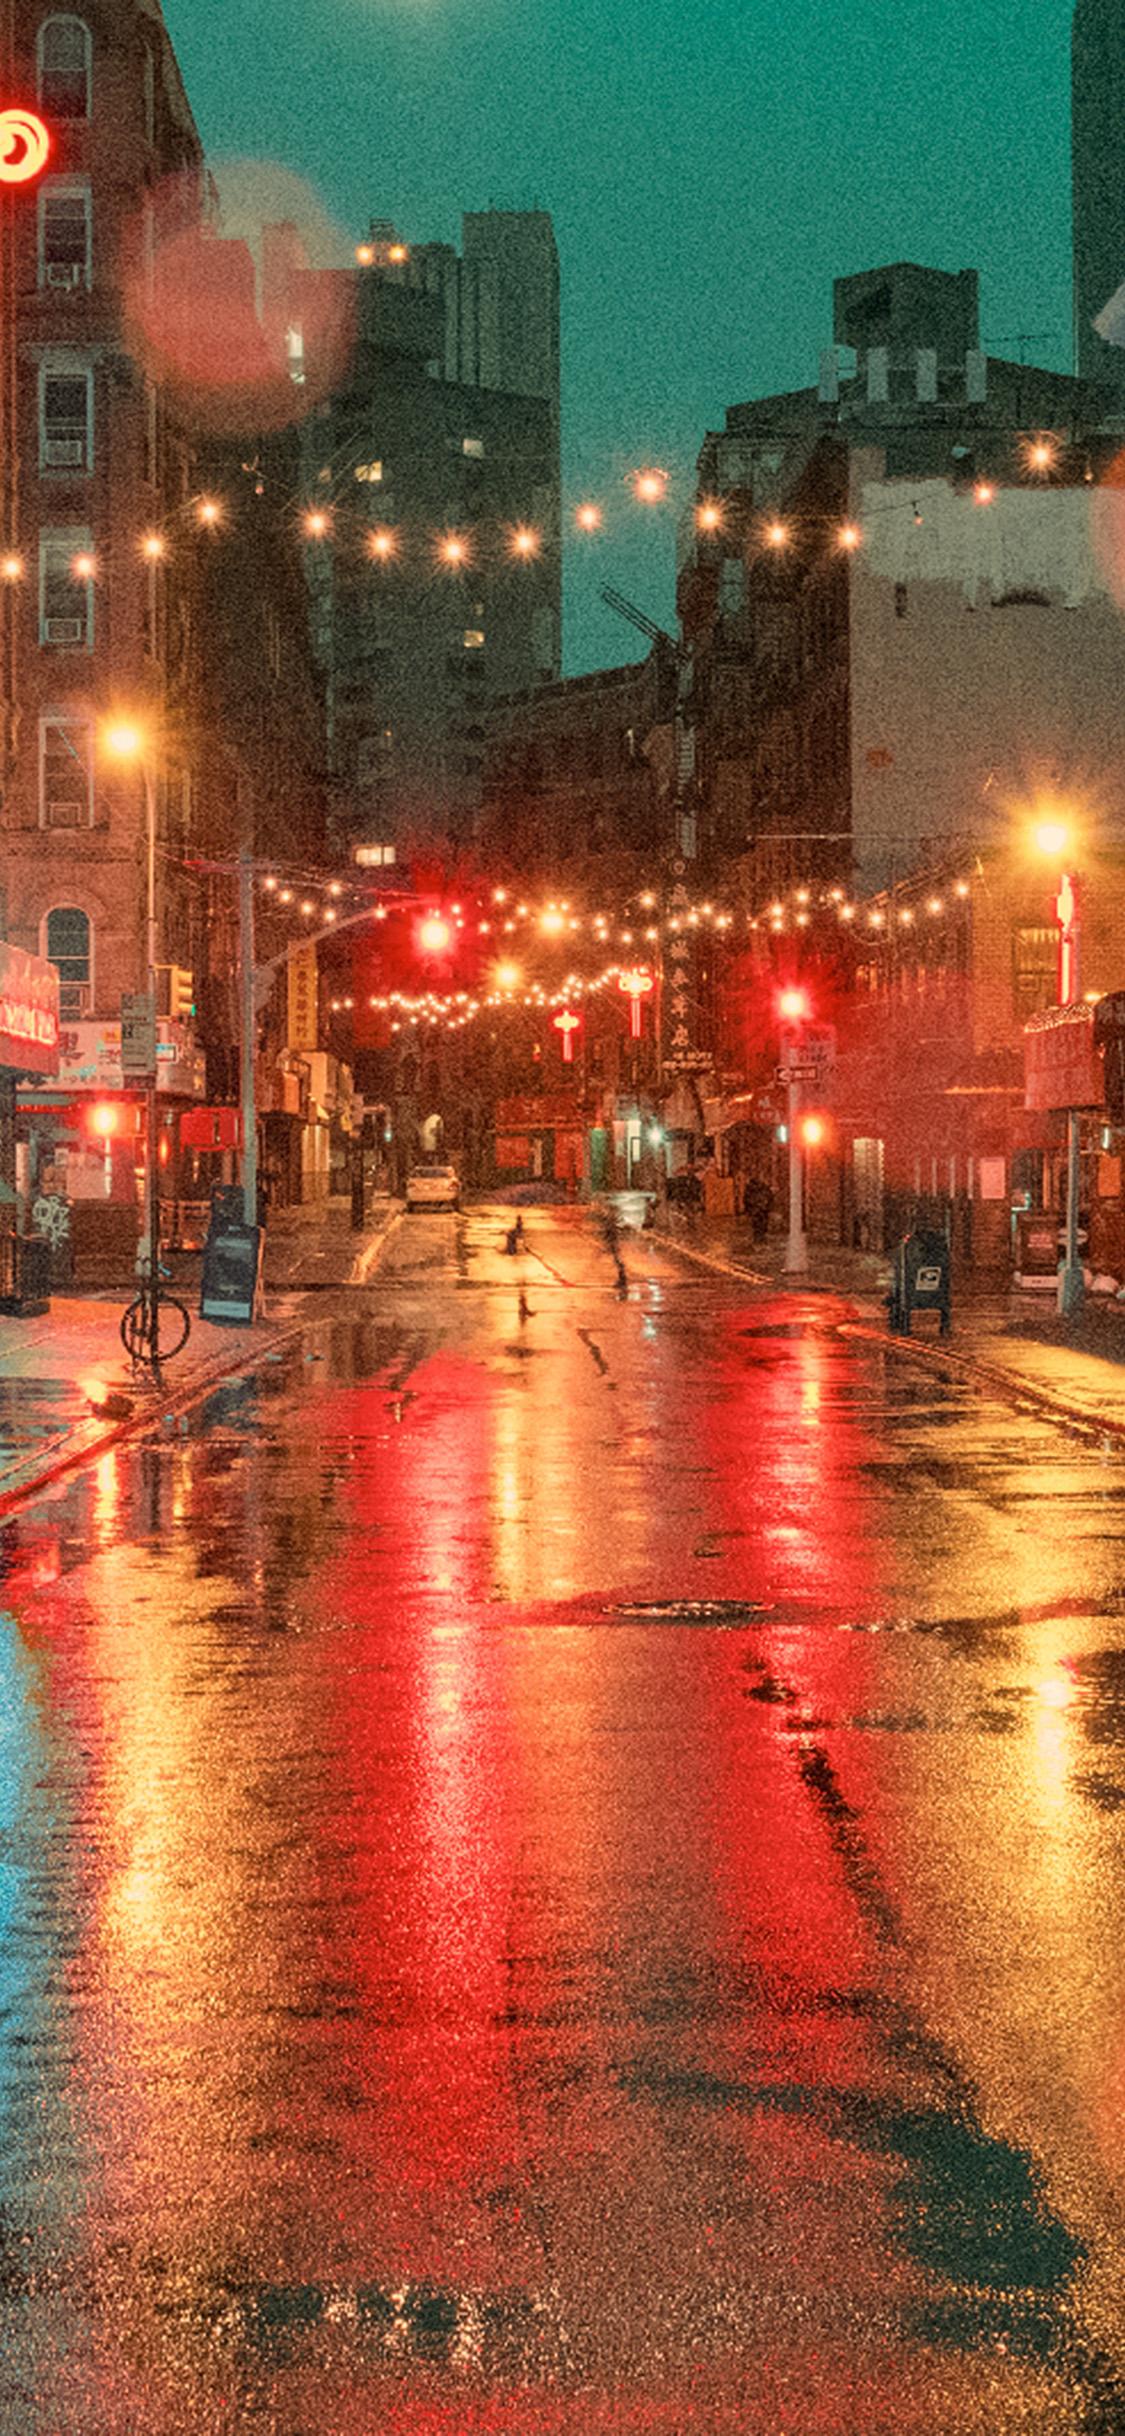 iPhonexpapers.com-Apple-iPhone-wallpaper-od57-nature-street-city-light-red-rain